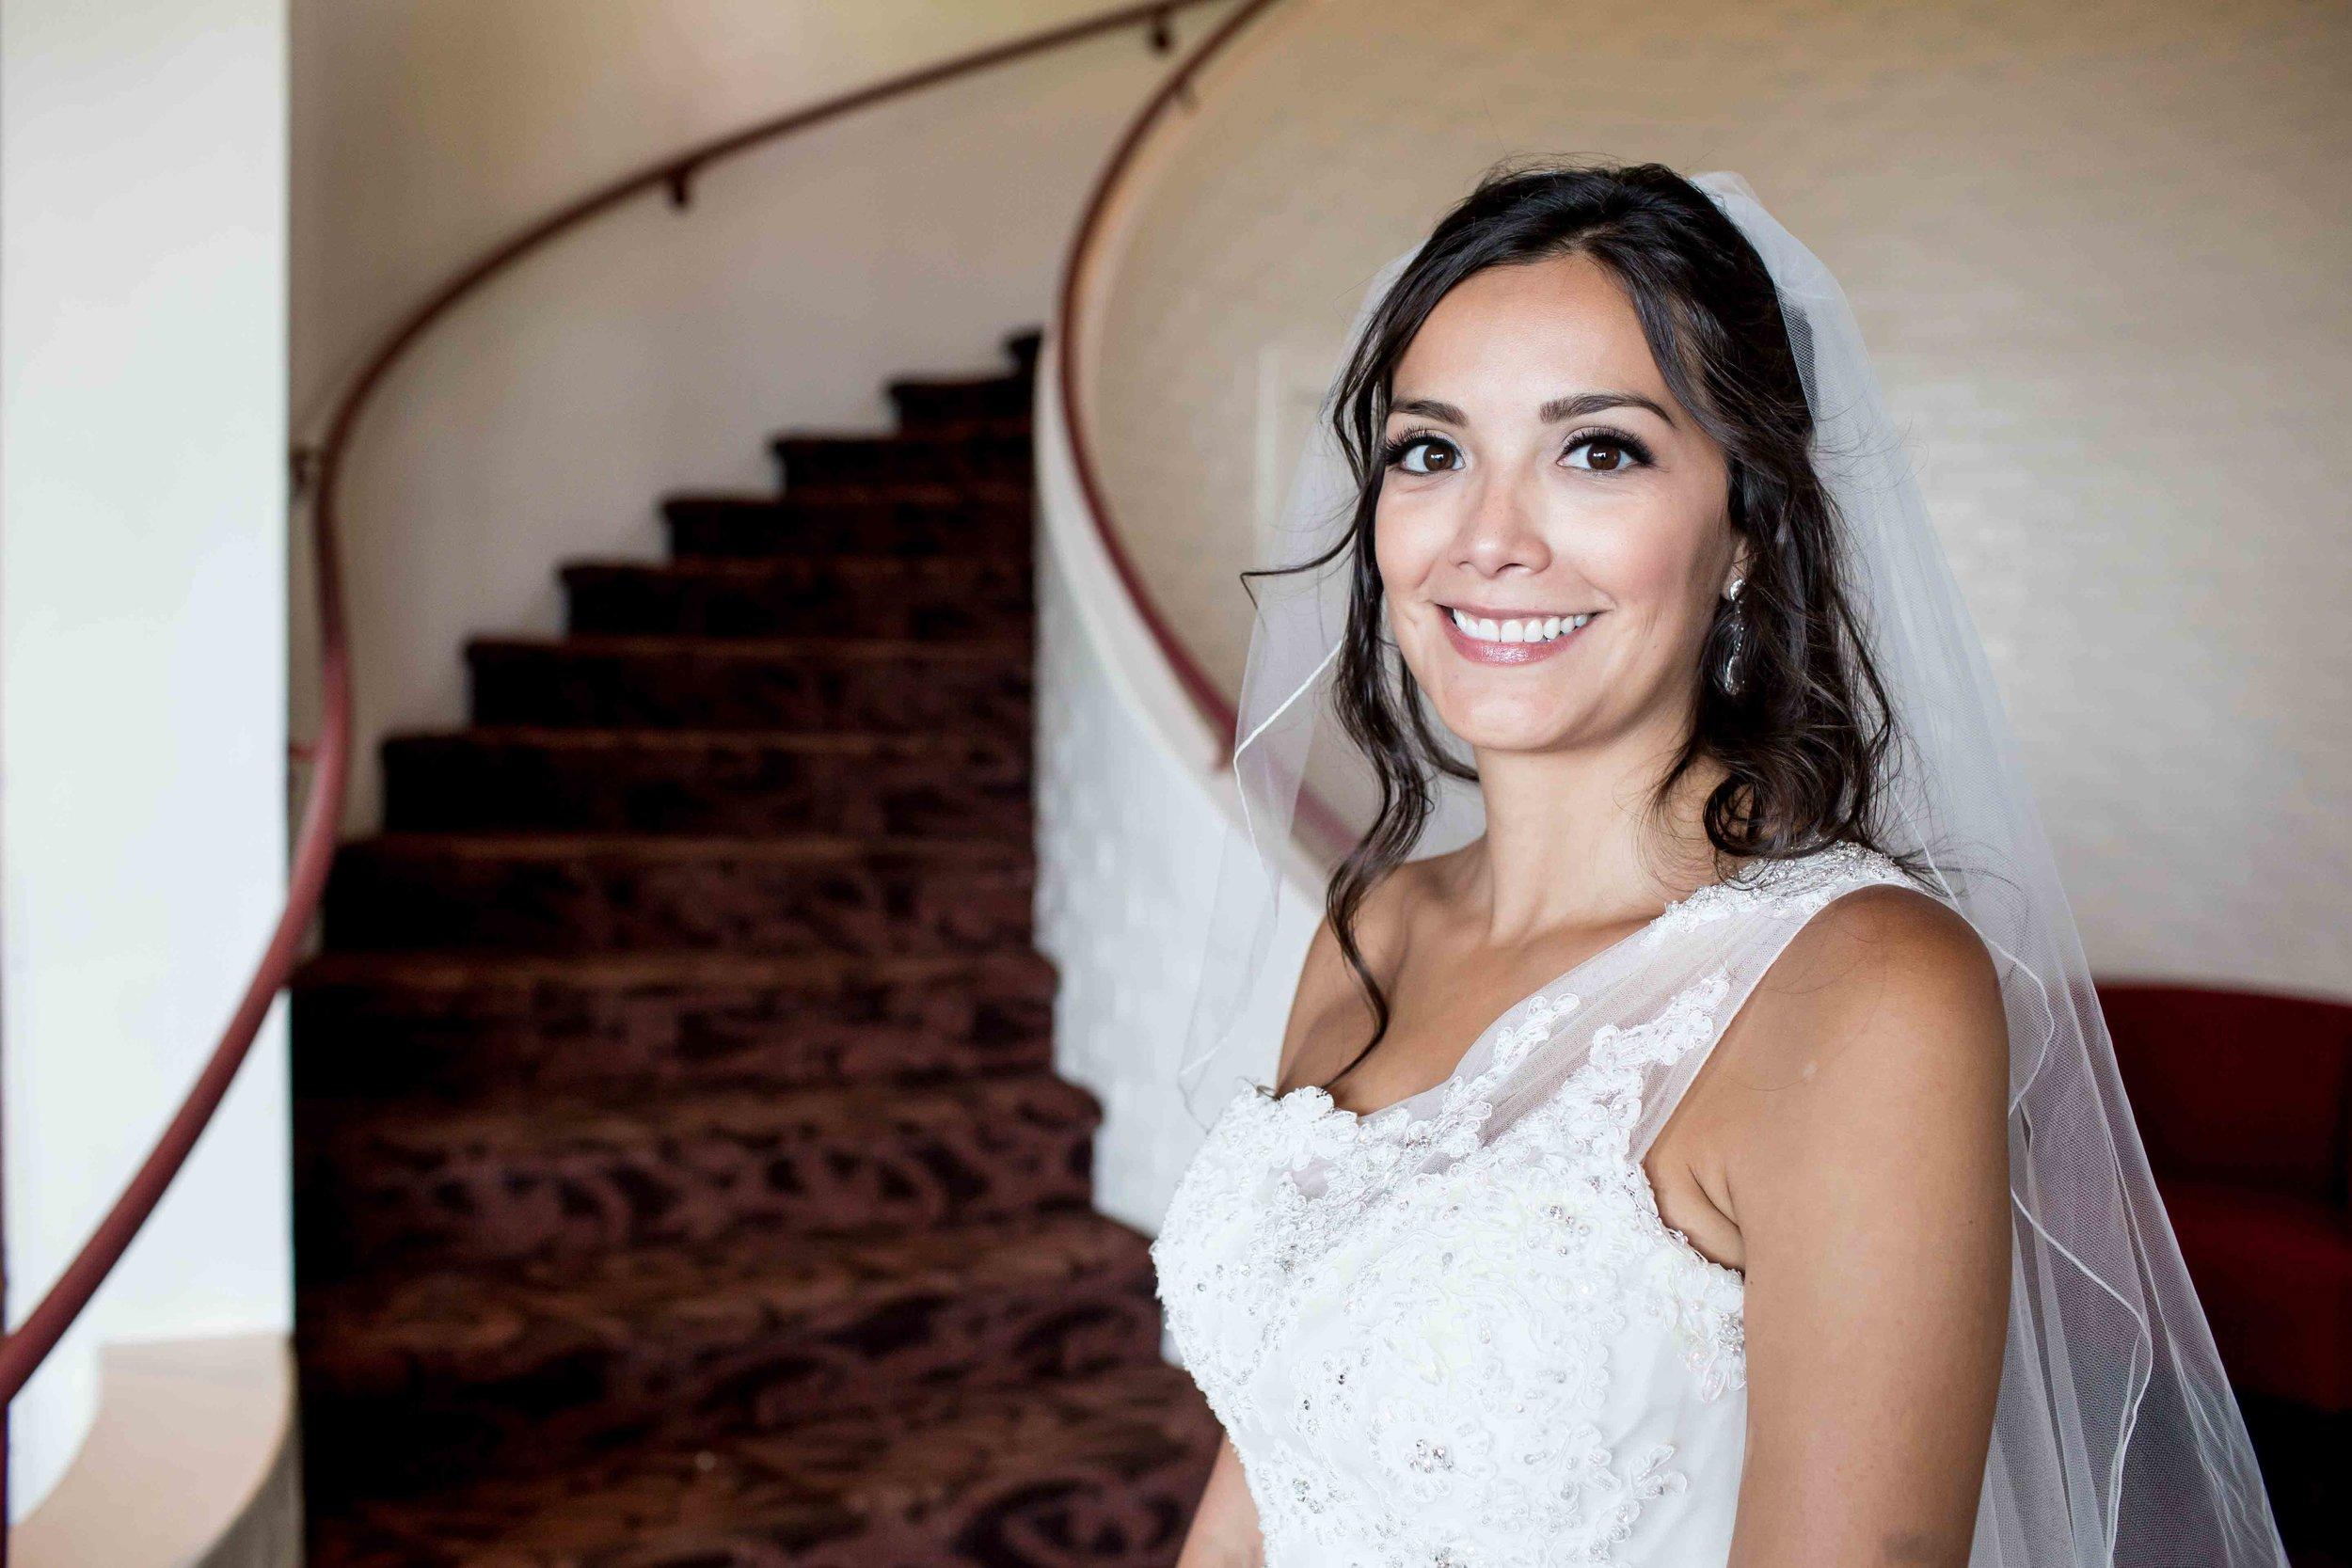 Destination Photographer wedding photos Best Wedding Photography Rose Photo -19.jpg